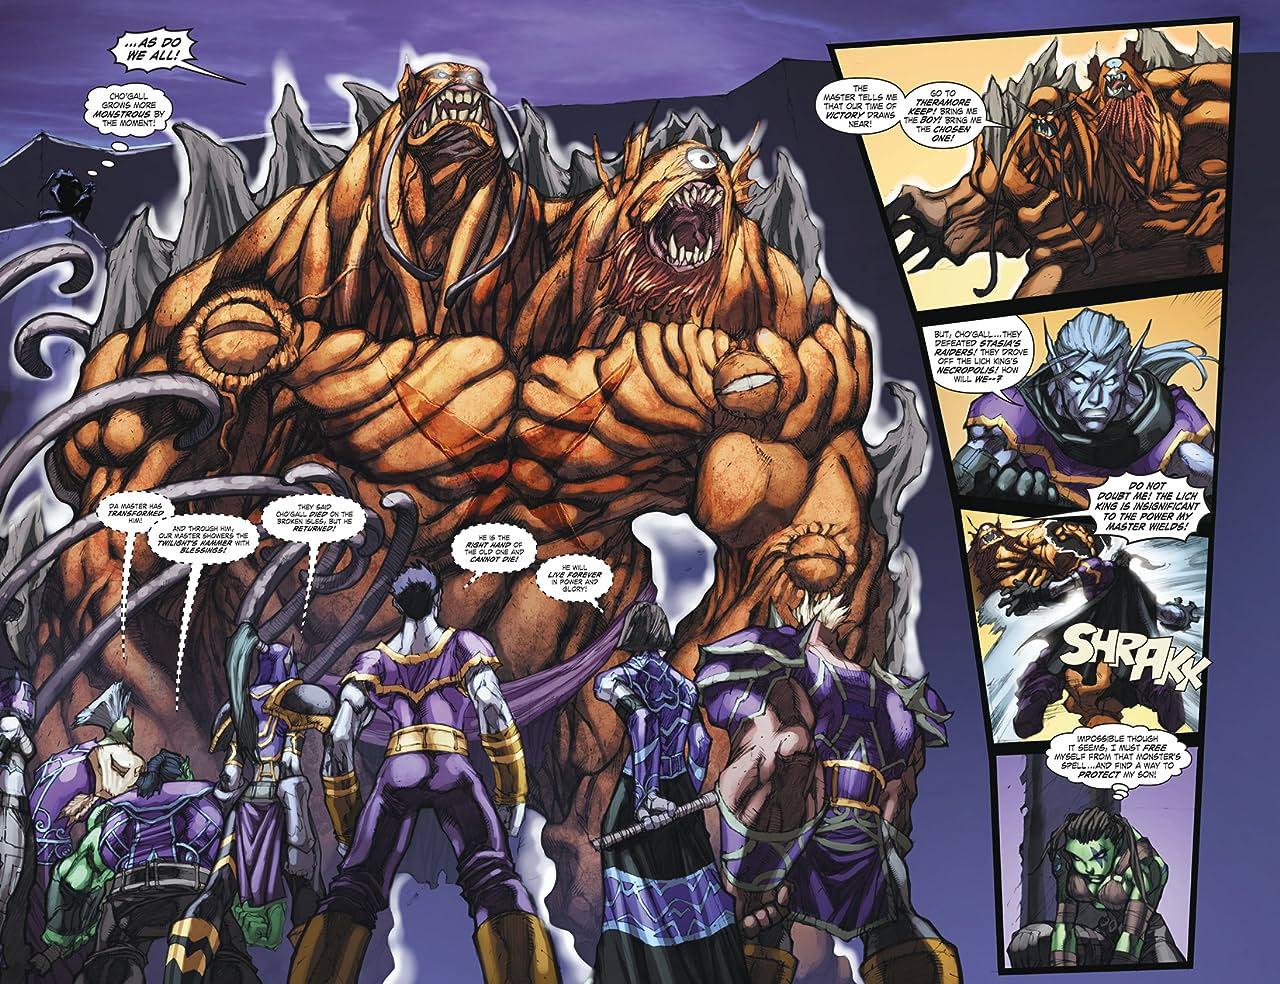 World of Warcraft #22